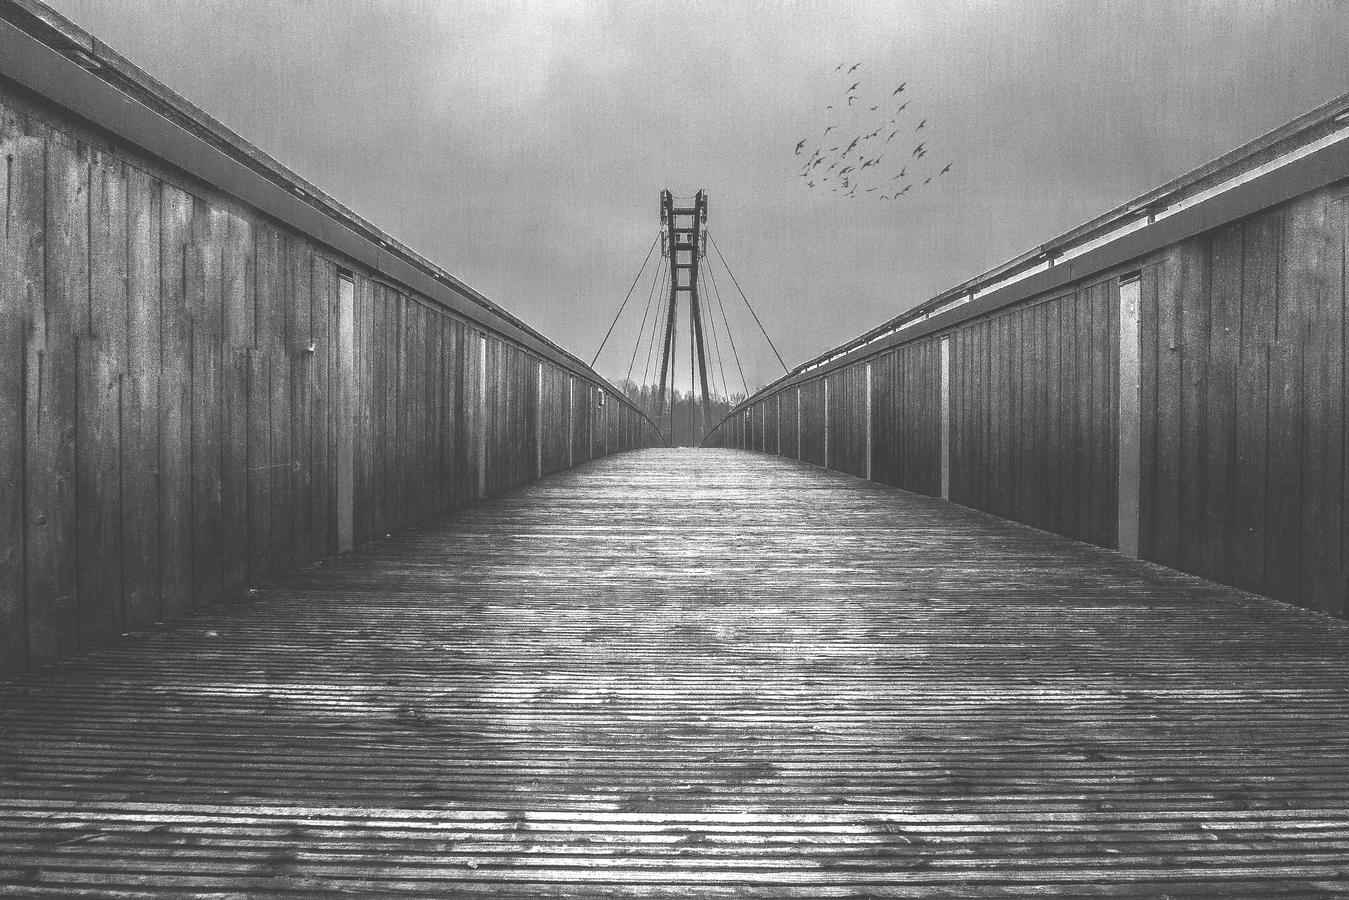 Mosty spajaju ludi